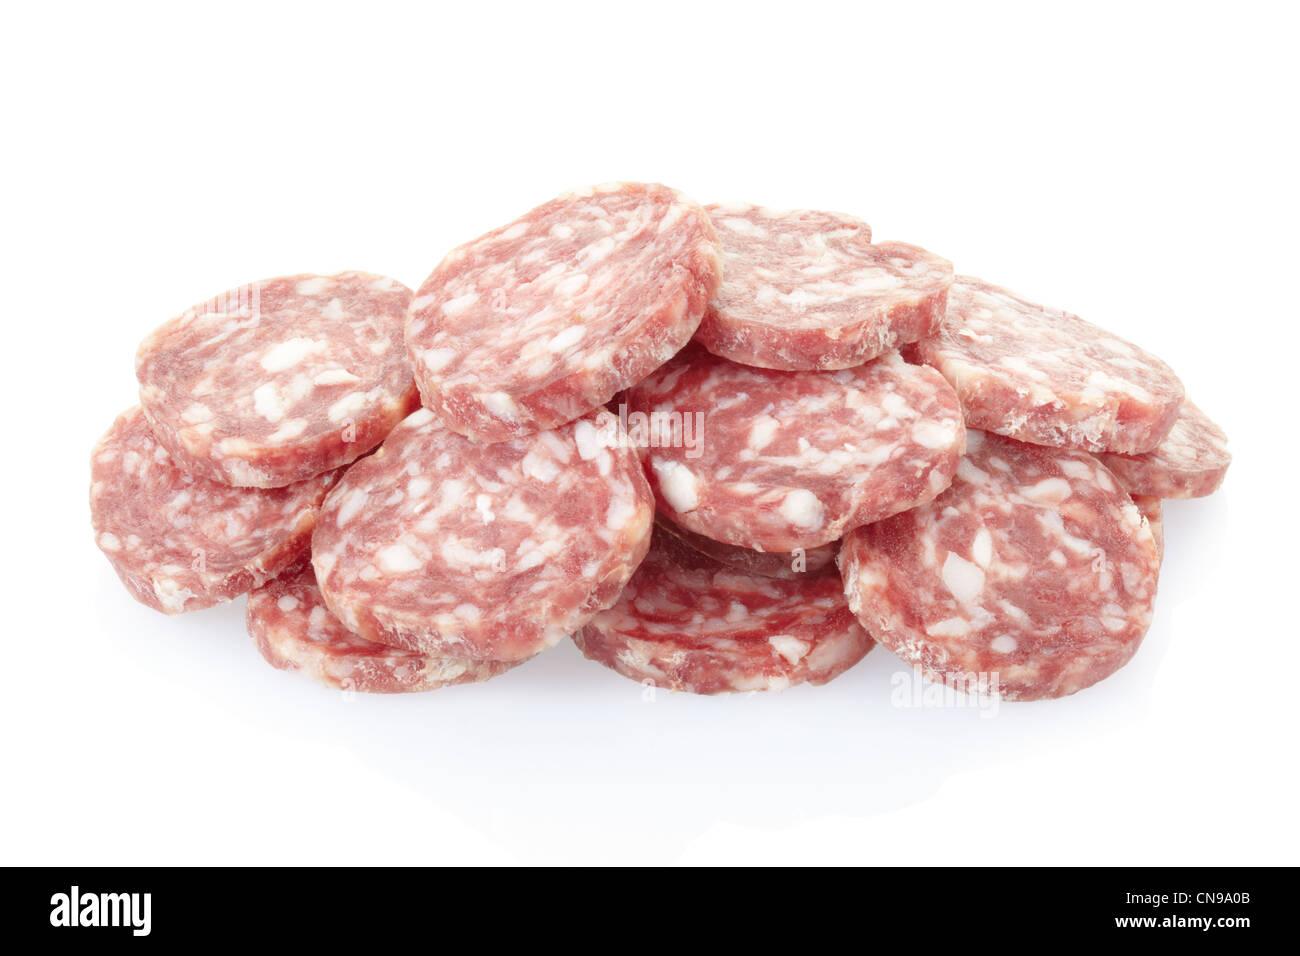 Salami slices pile - Stock Image